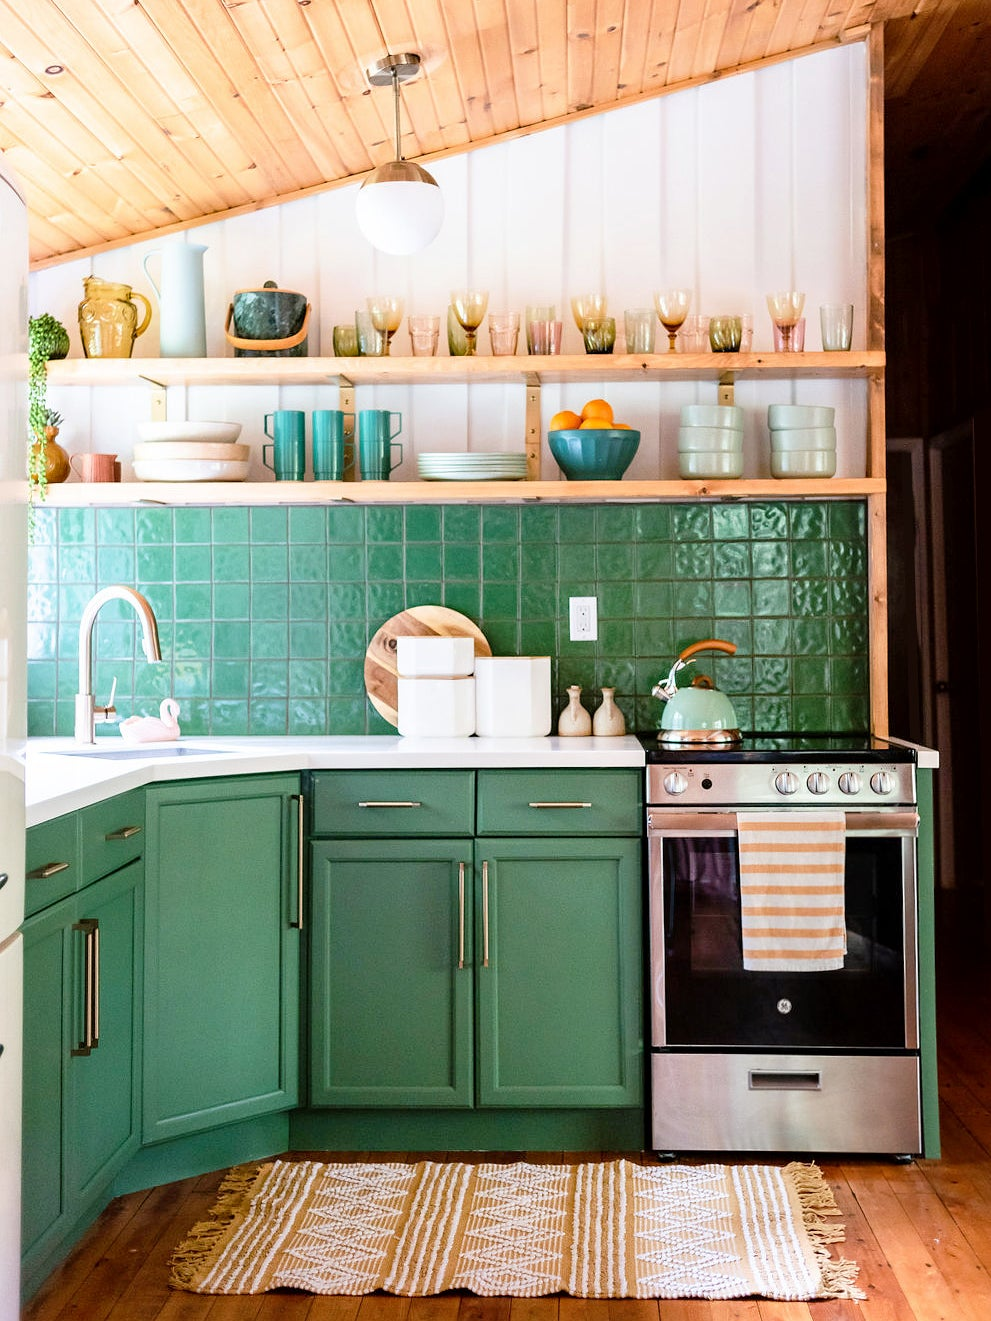 00-FEATURE-Muskoka-Cottage-renovation-domino-kitchen-after